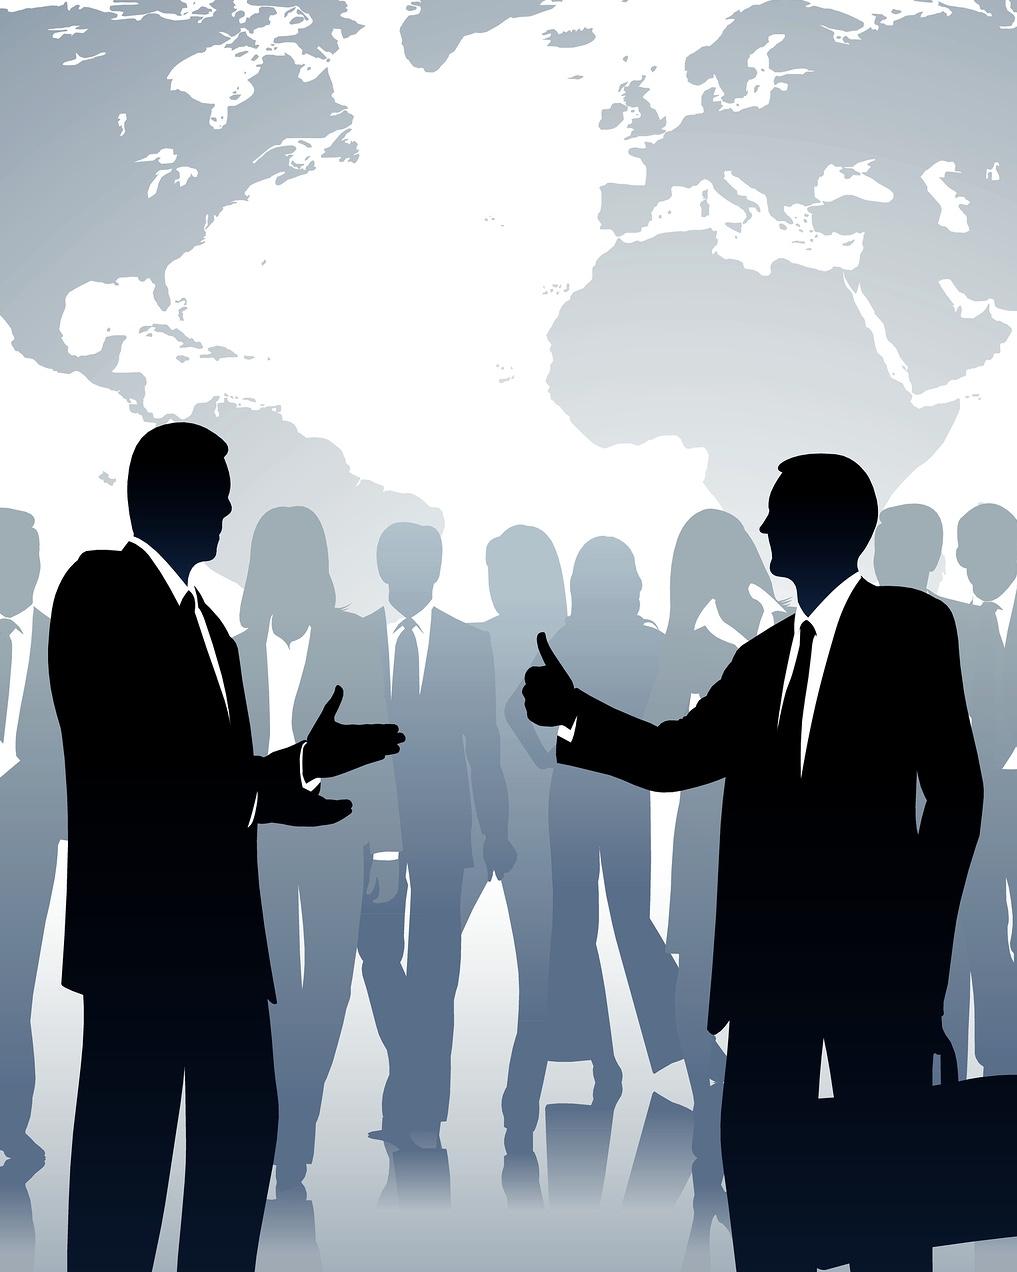 Global professional network